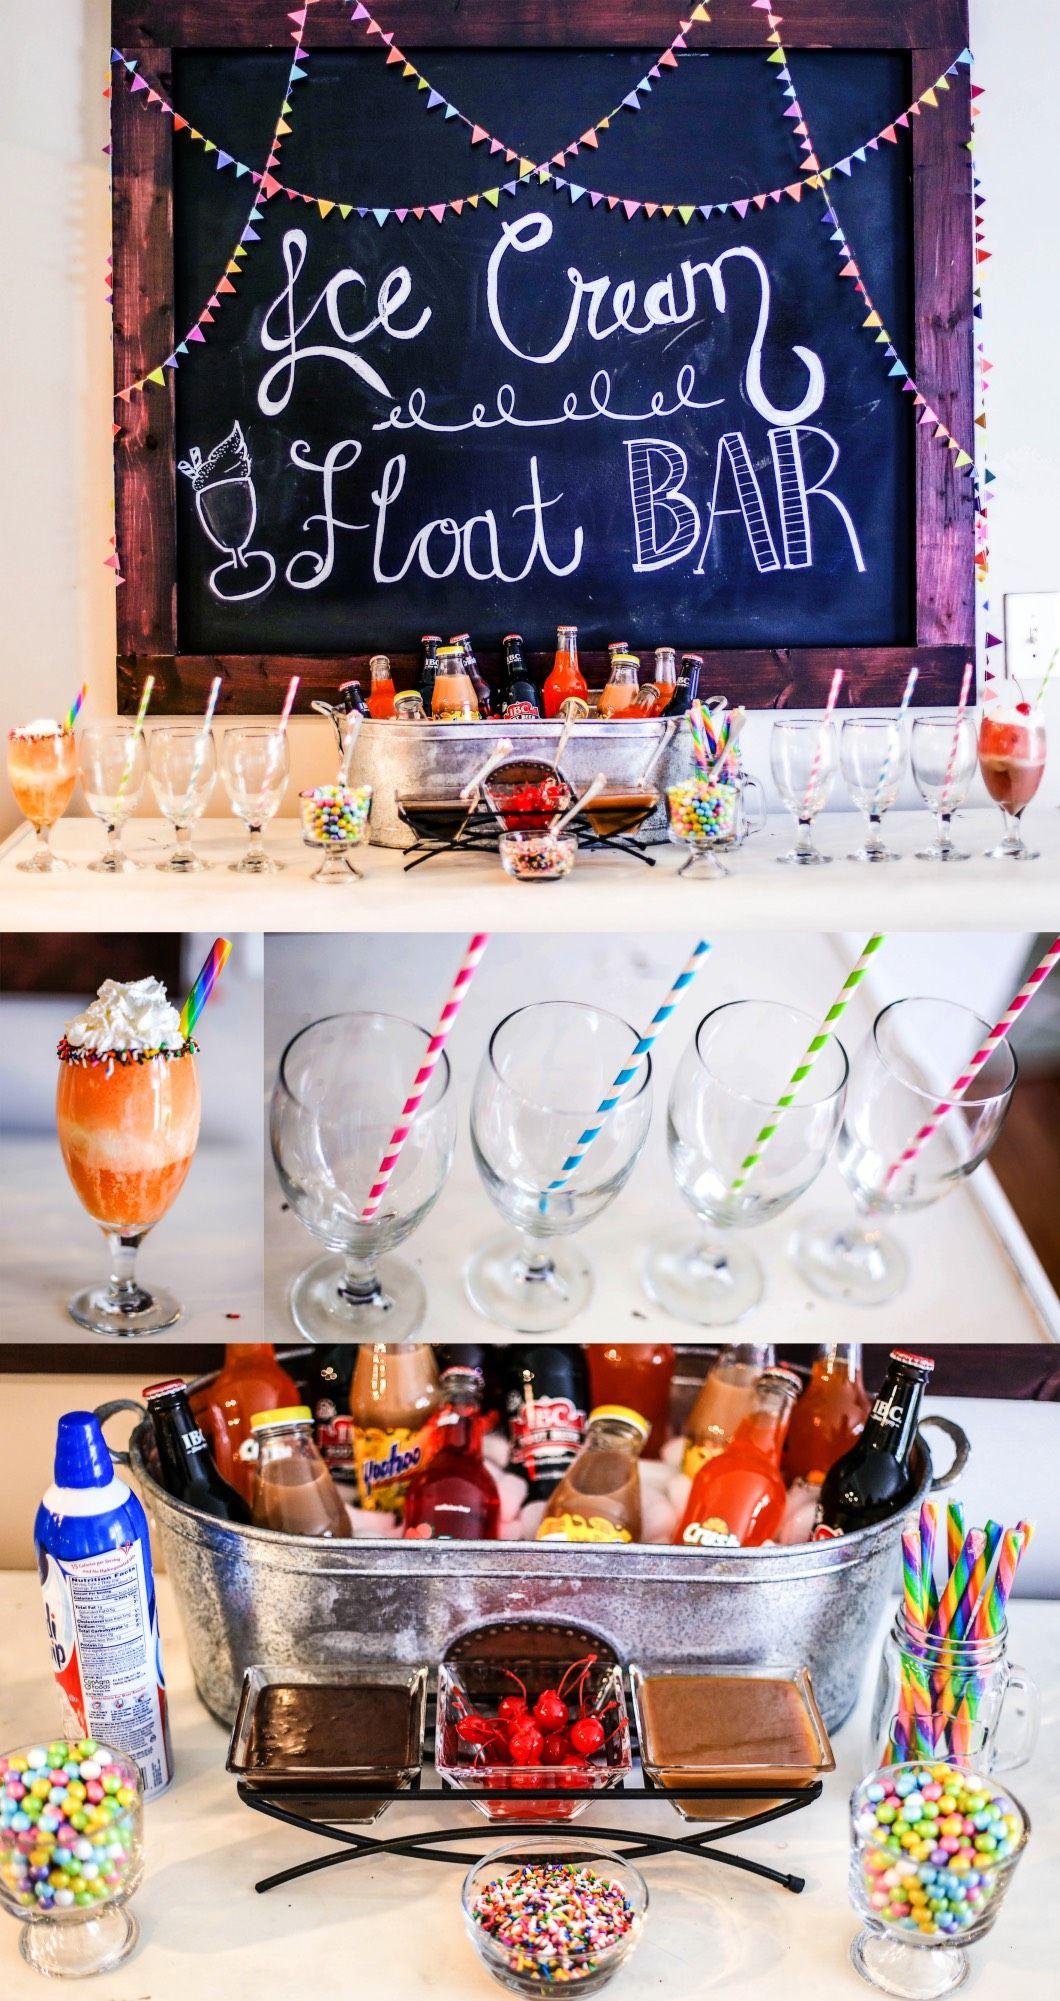 Ice Cream Float Bar Sleepover Ideas For TeensChristmas Party